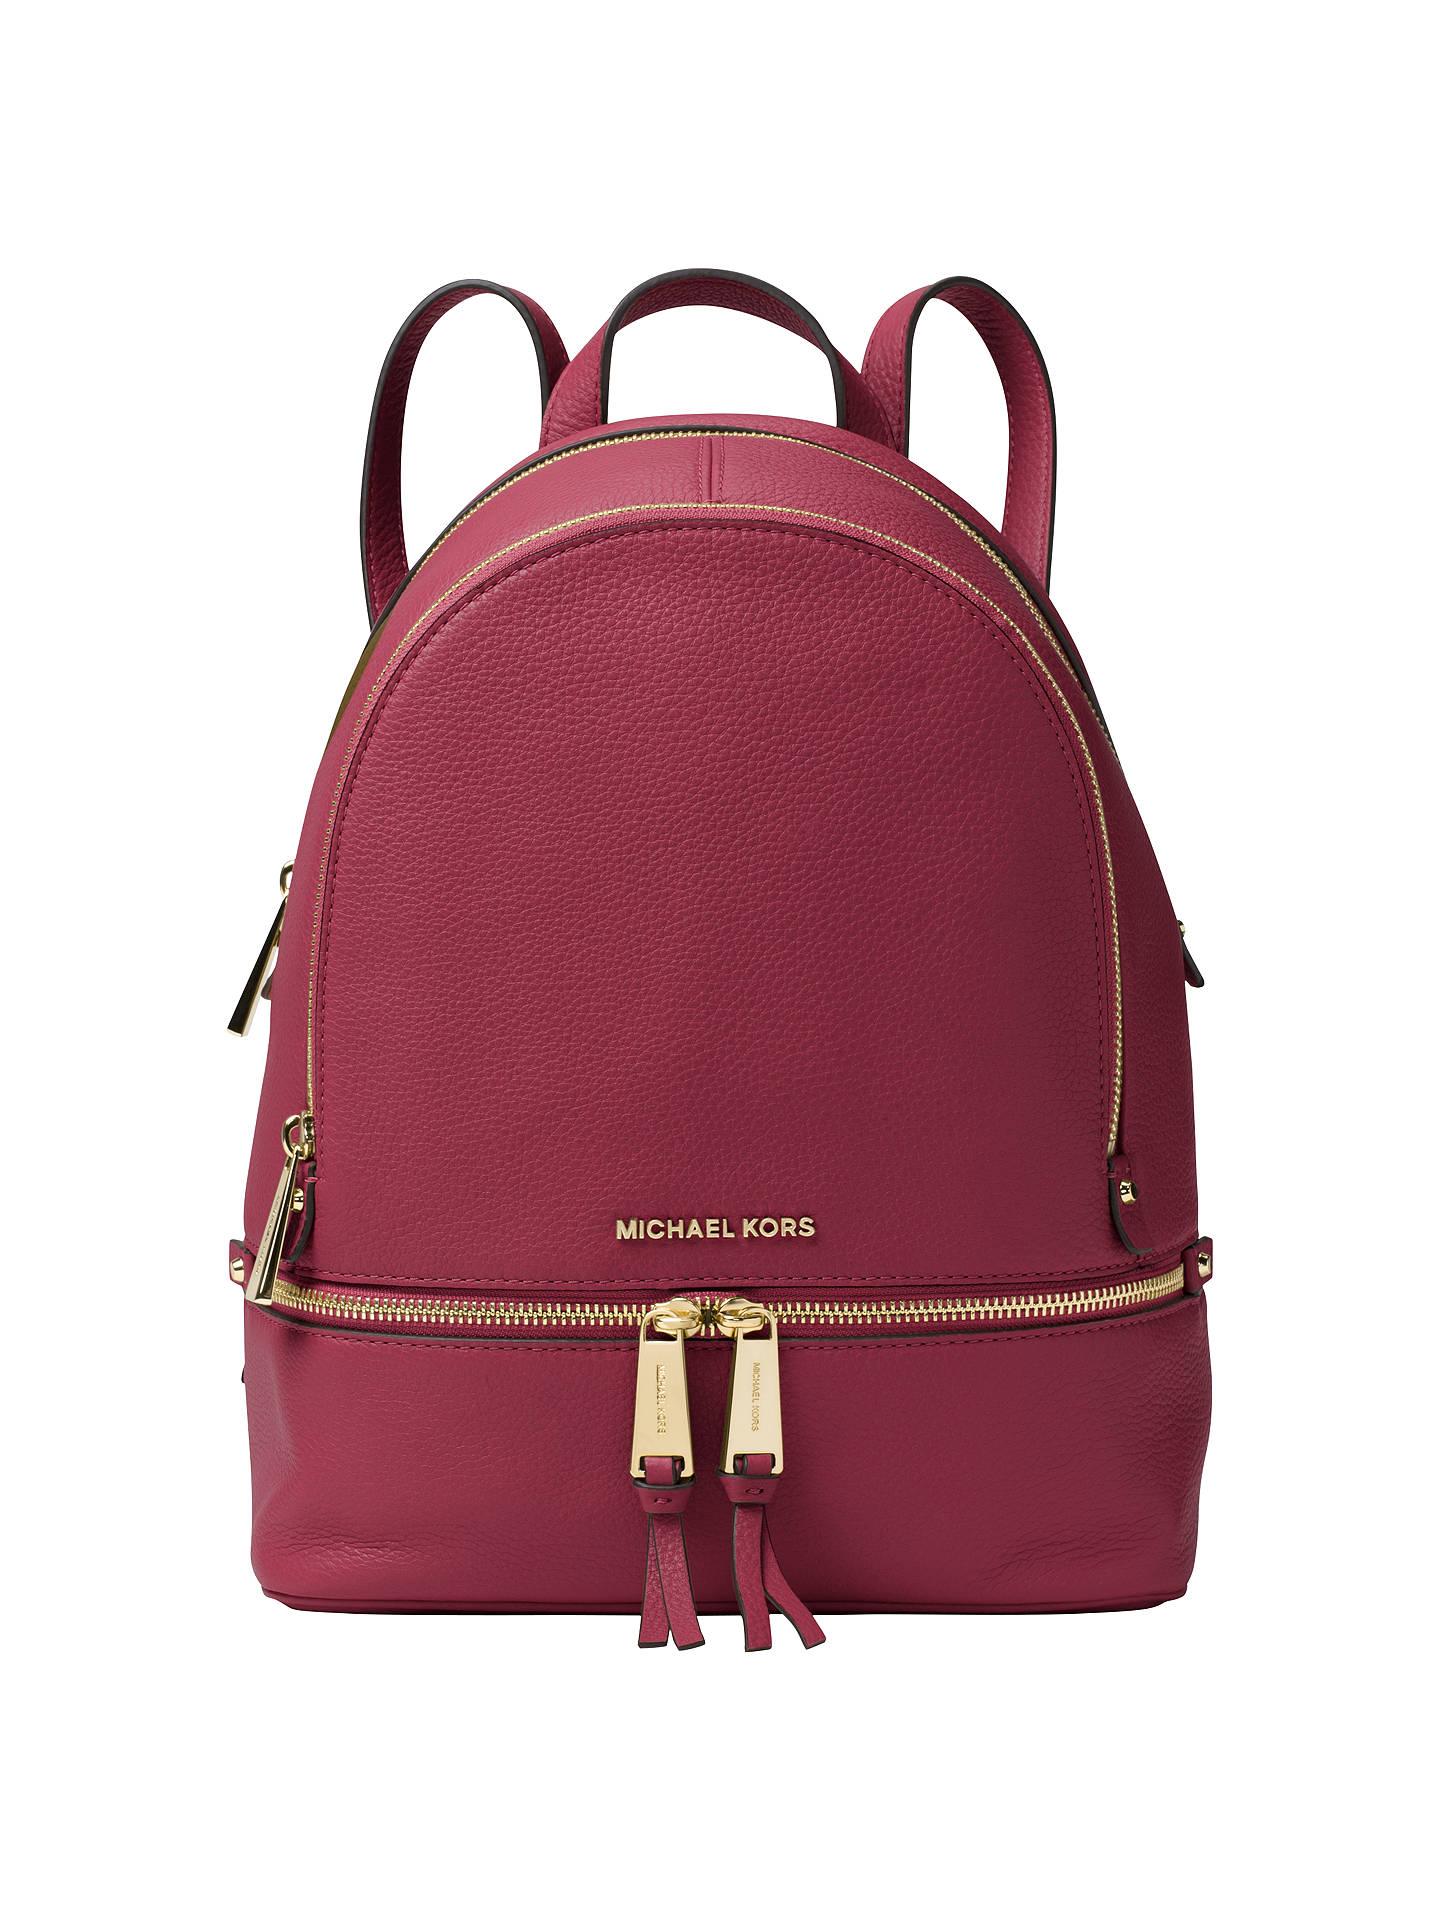 37744b5c3021af Buy MICHAEL Michael Kors Rhea Leather Backpack, Mulberry Online at  johnlewis.com ...